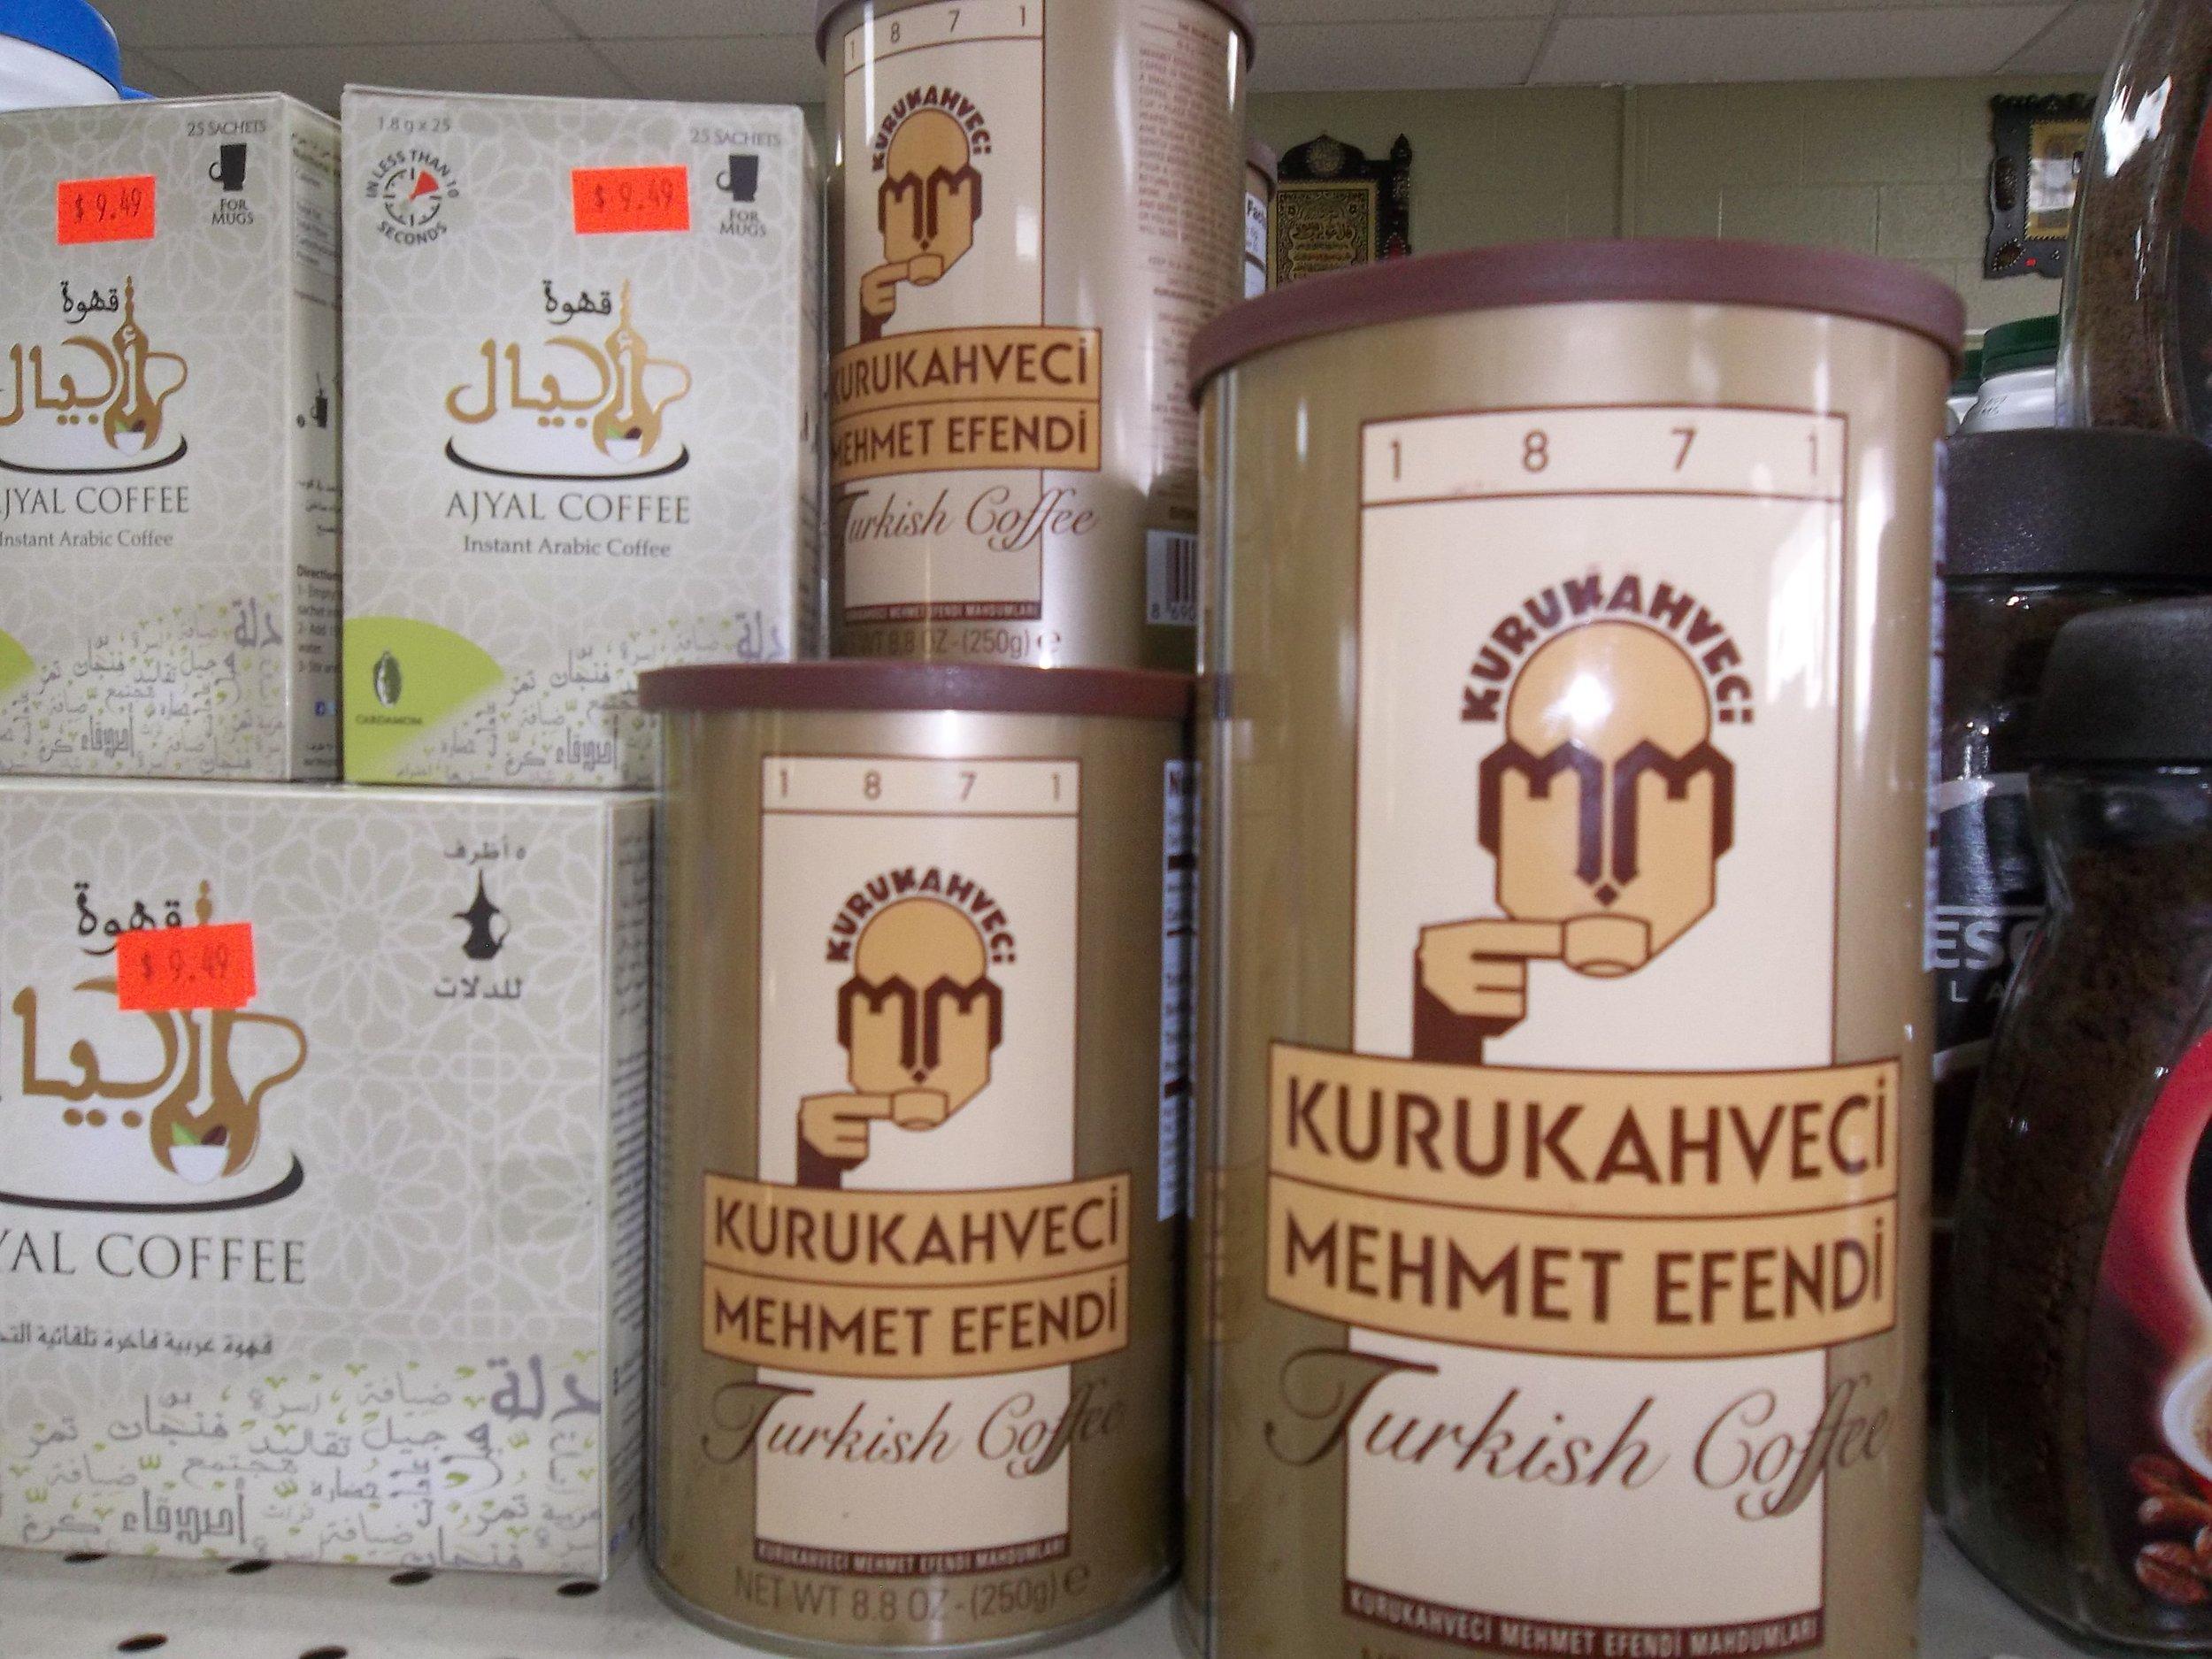 Turkish-Coffee-Pak-Halal-Mediterranean- Grocery-Store-12259-W-87th-St-Pkwy-Lenexa-KS-66215.JPG